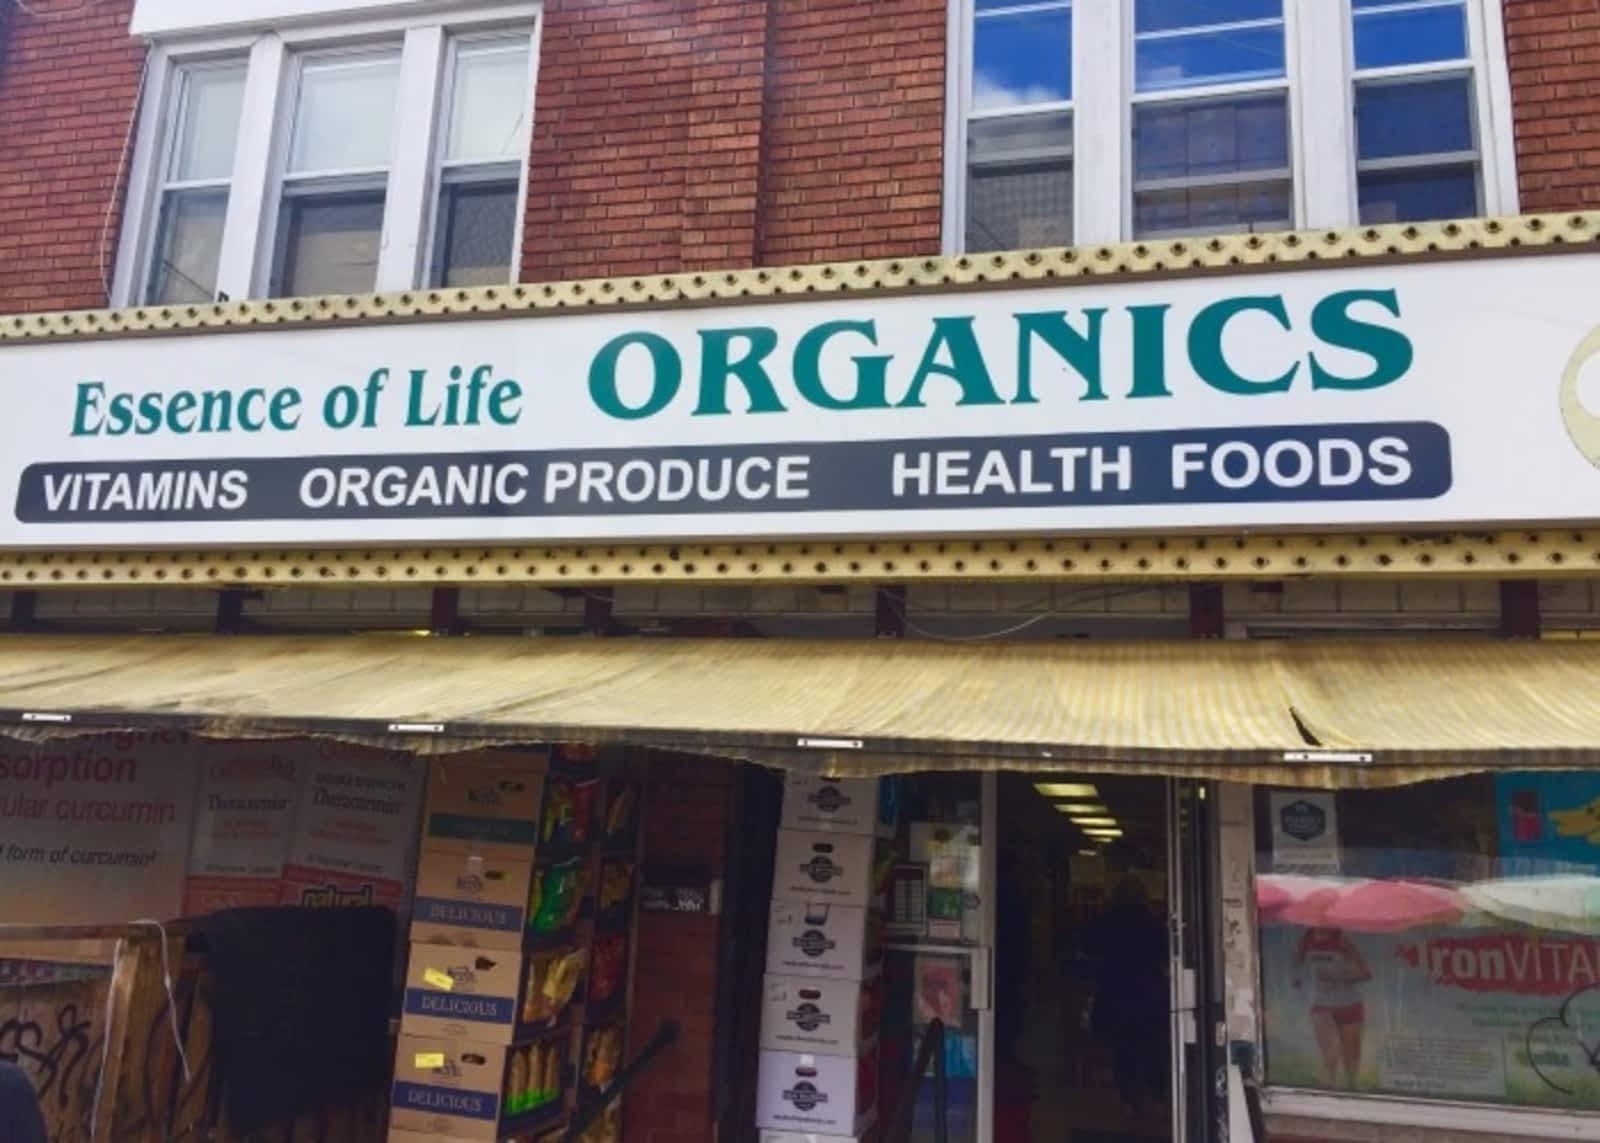 Essence of Life Organics Green Shop Toronto